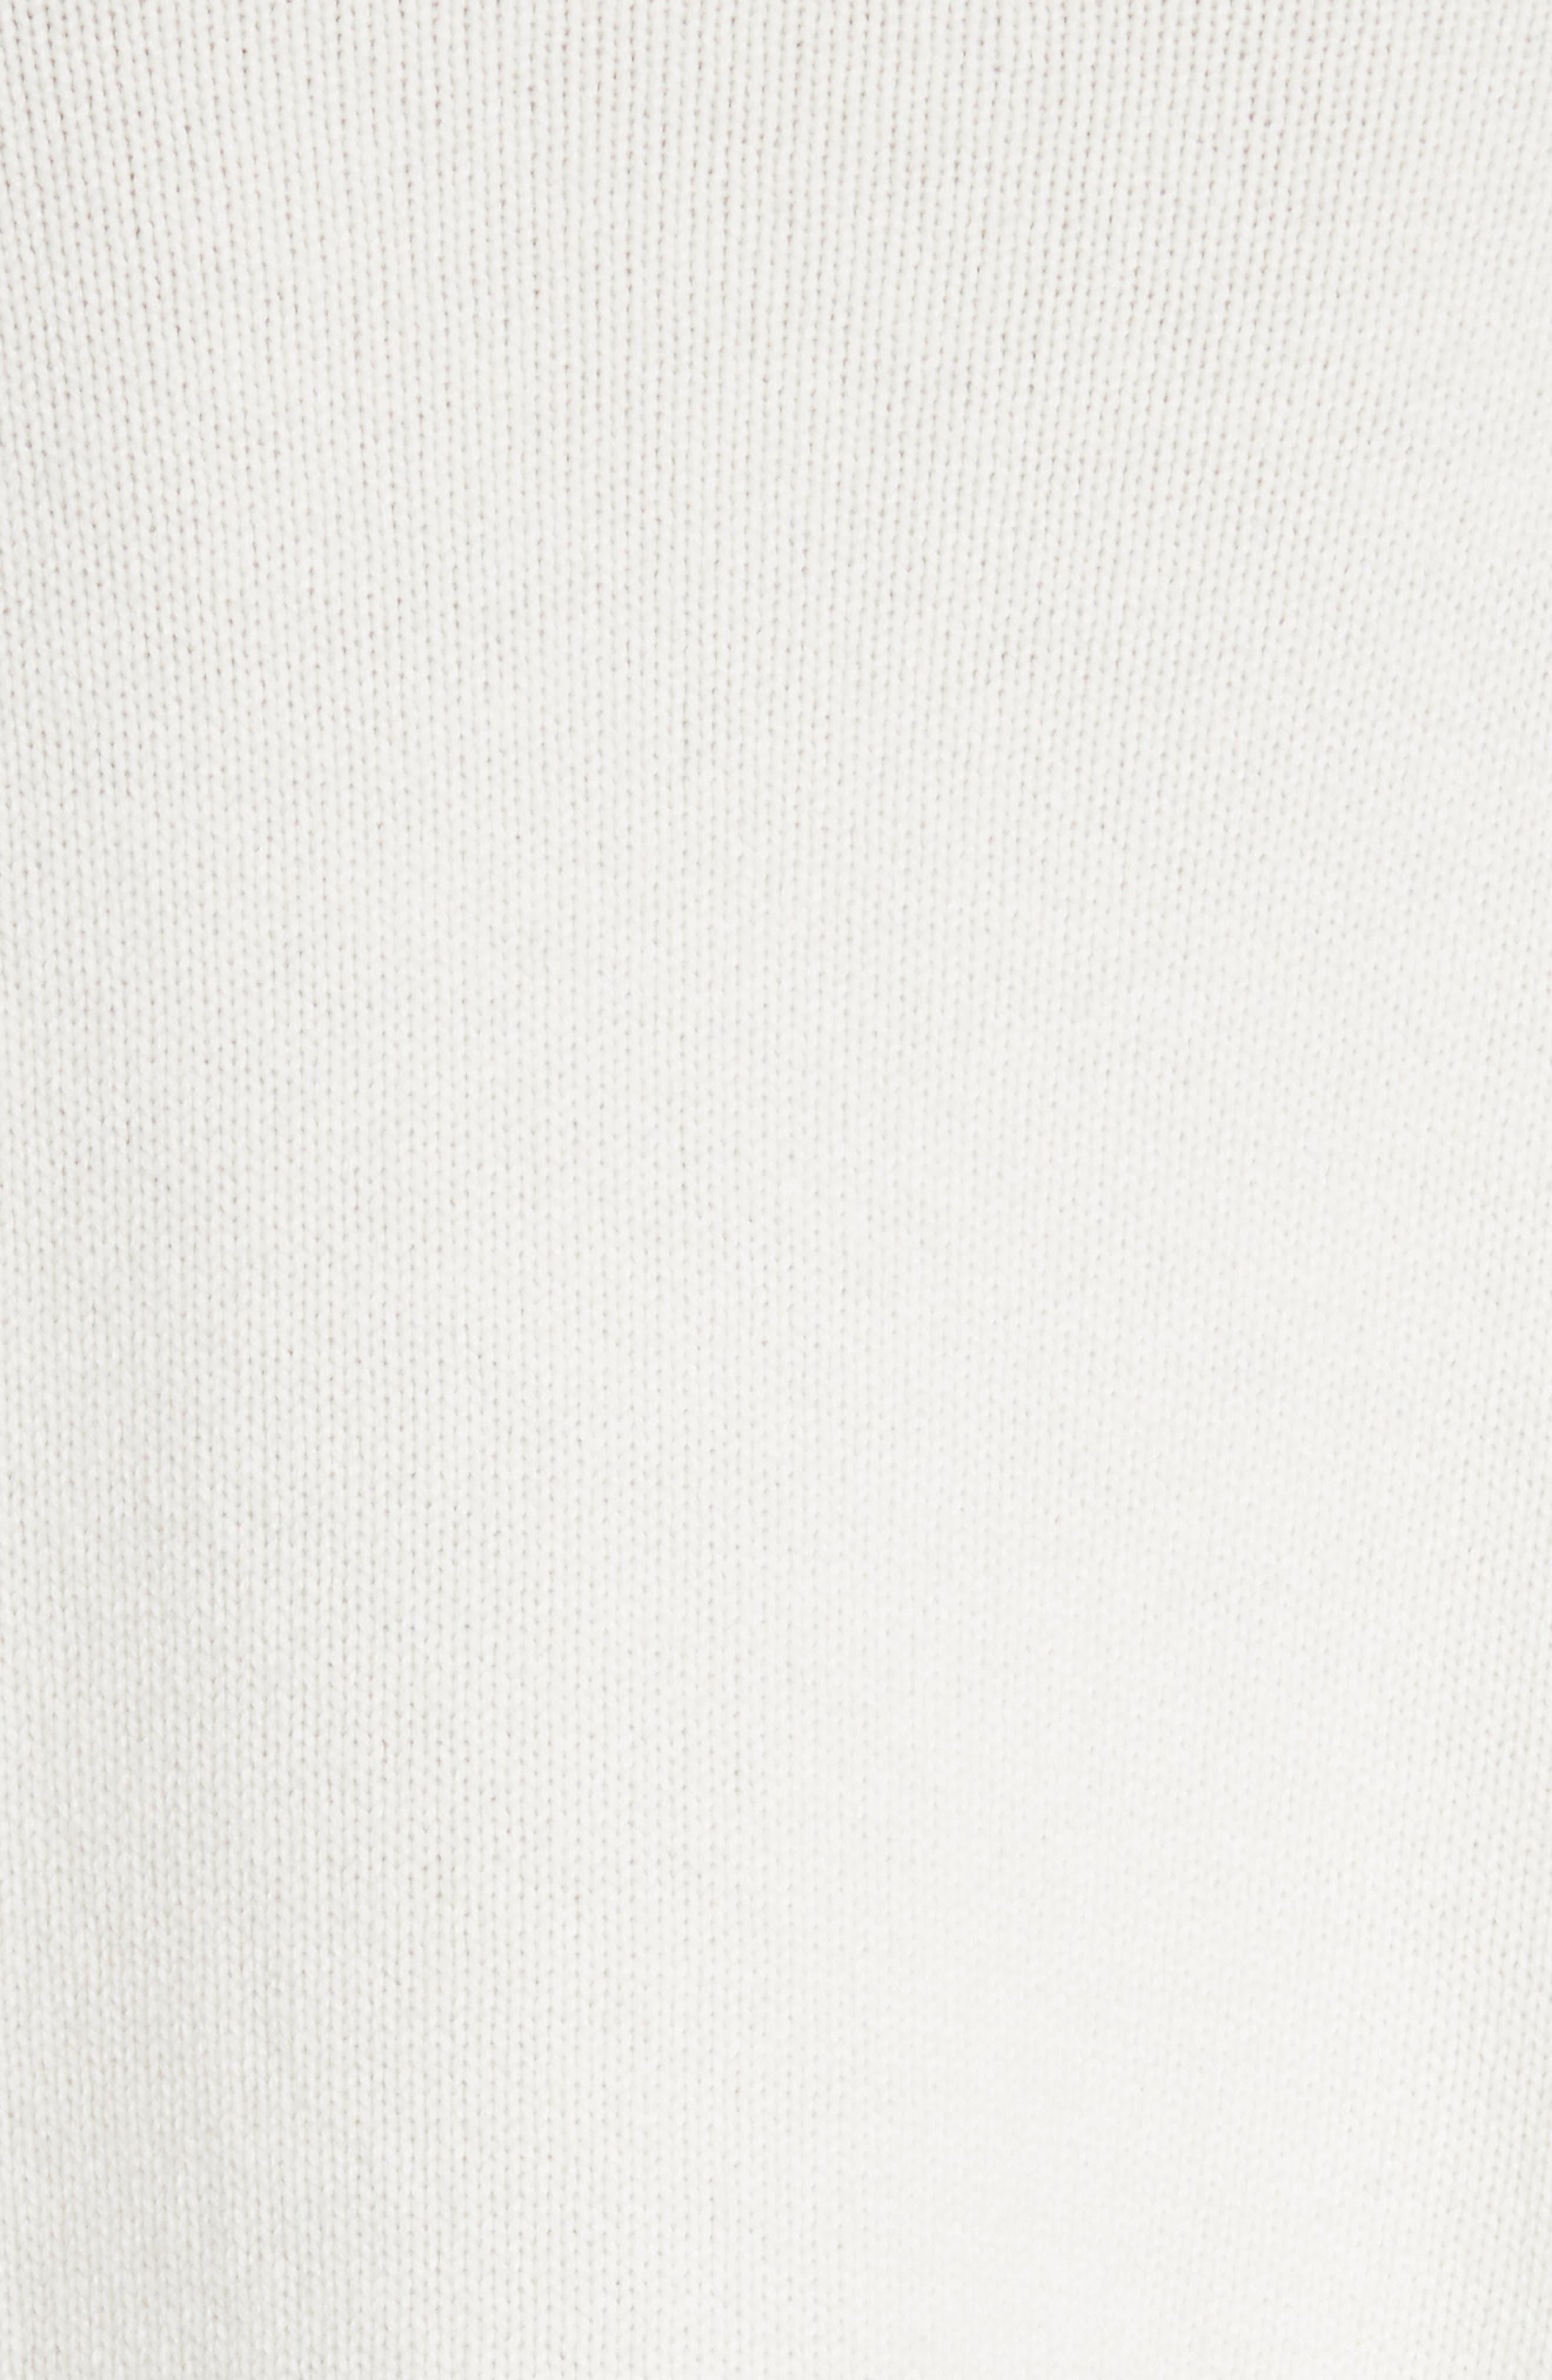 Aubree Funnel Neck Cashmere Sweater,                             Alternate thumbnail 5, color,                             908